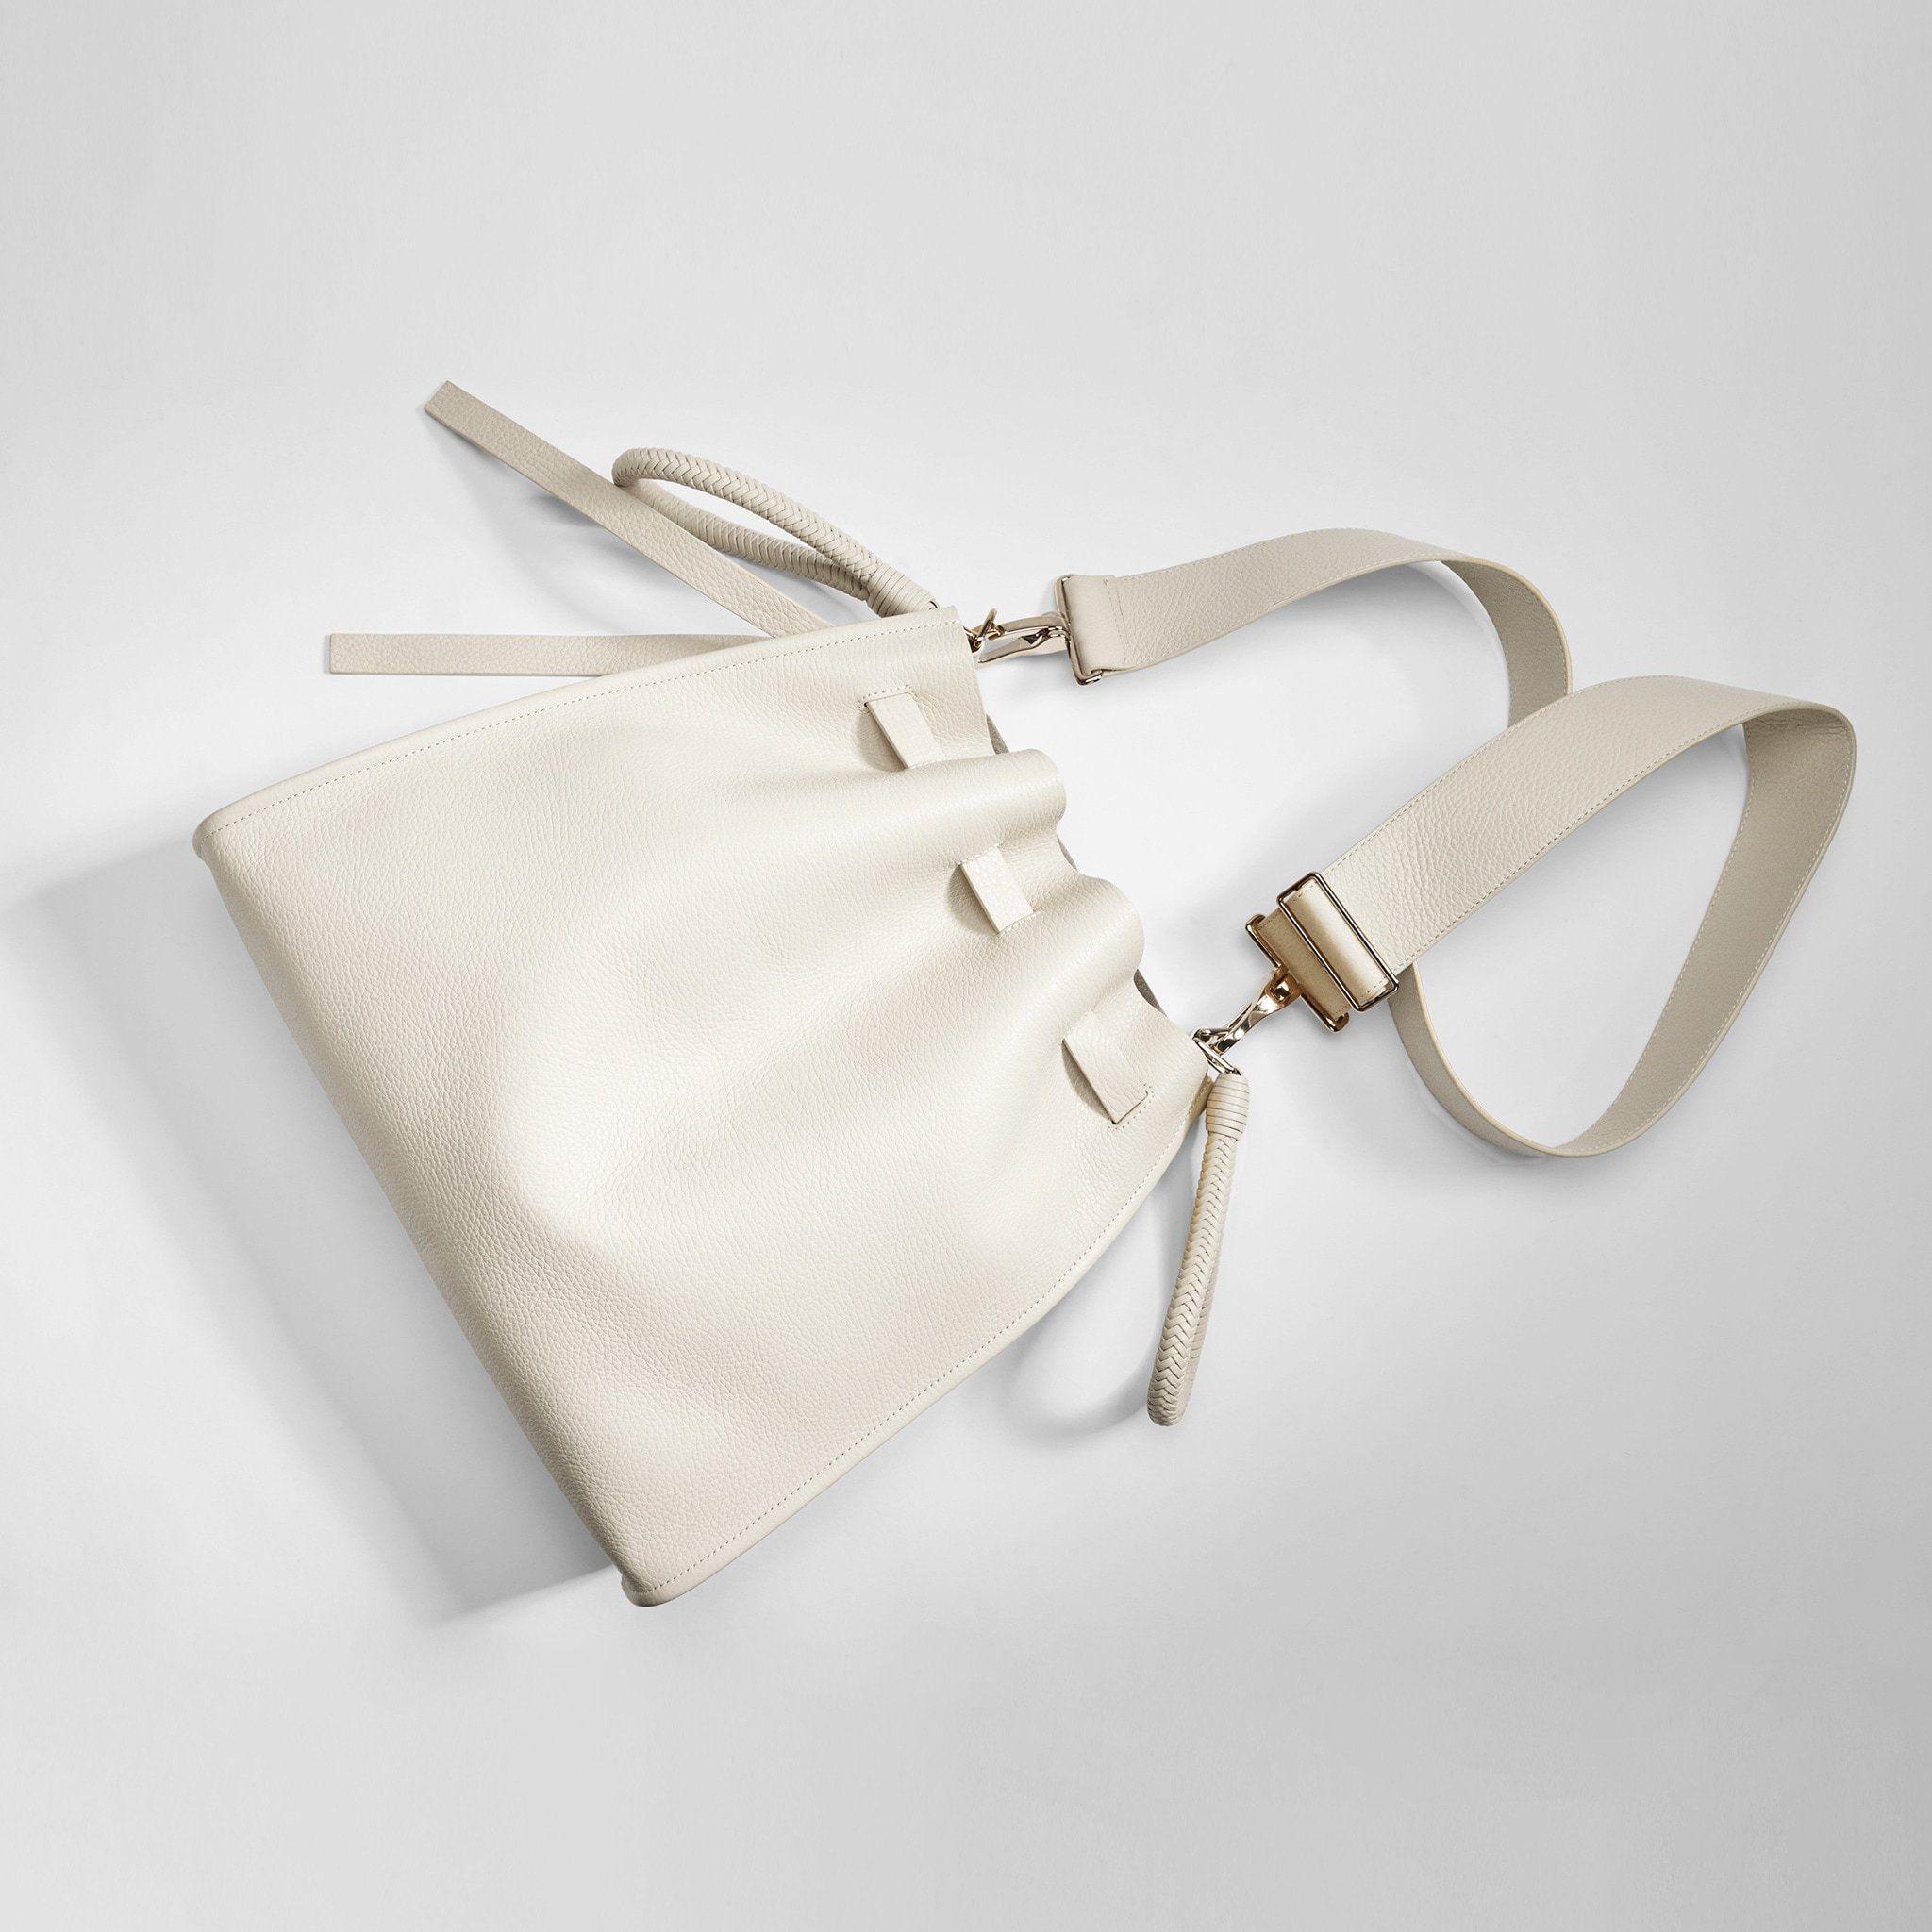 d6f476028f Kiss - Vitello – Tamara Mellon Leather Pouch, Leather Handle, Everyday Bag,  Gold